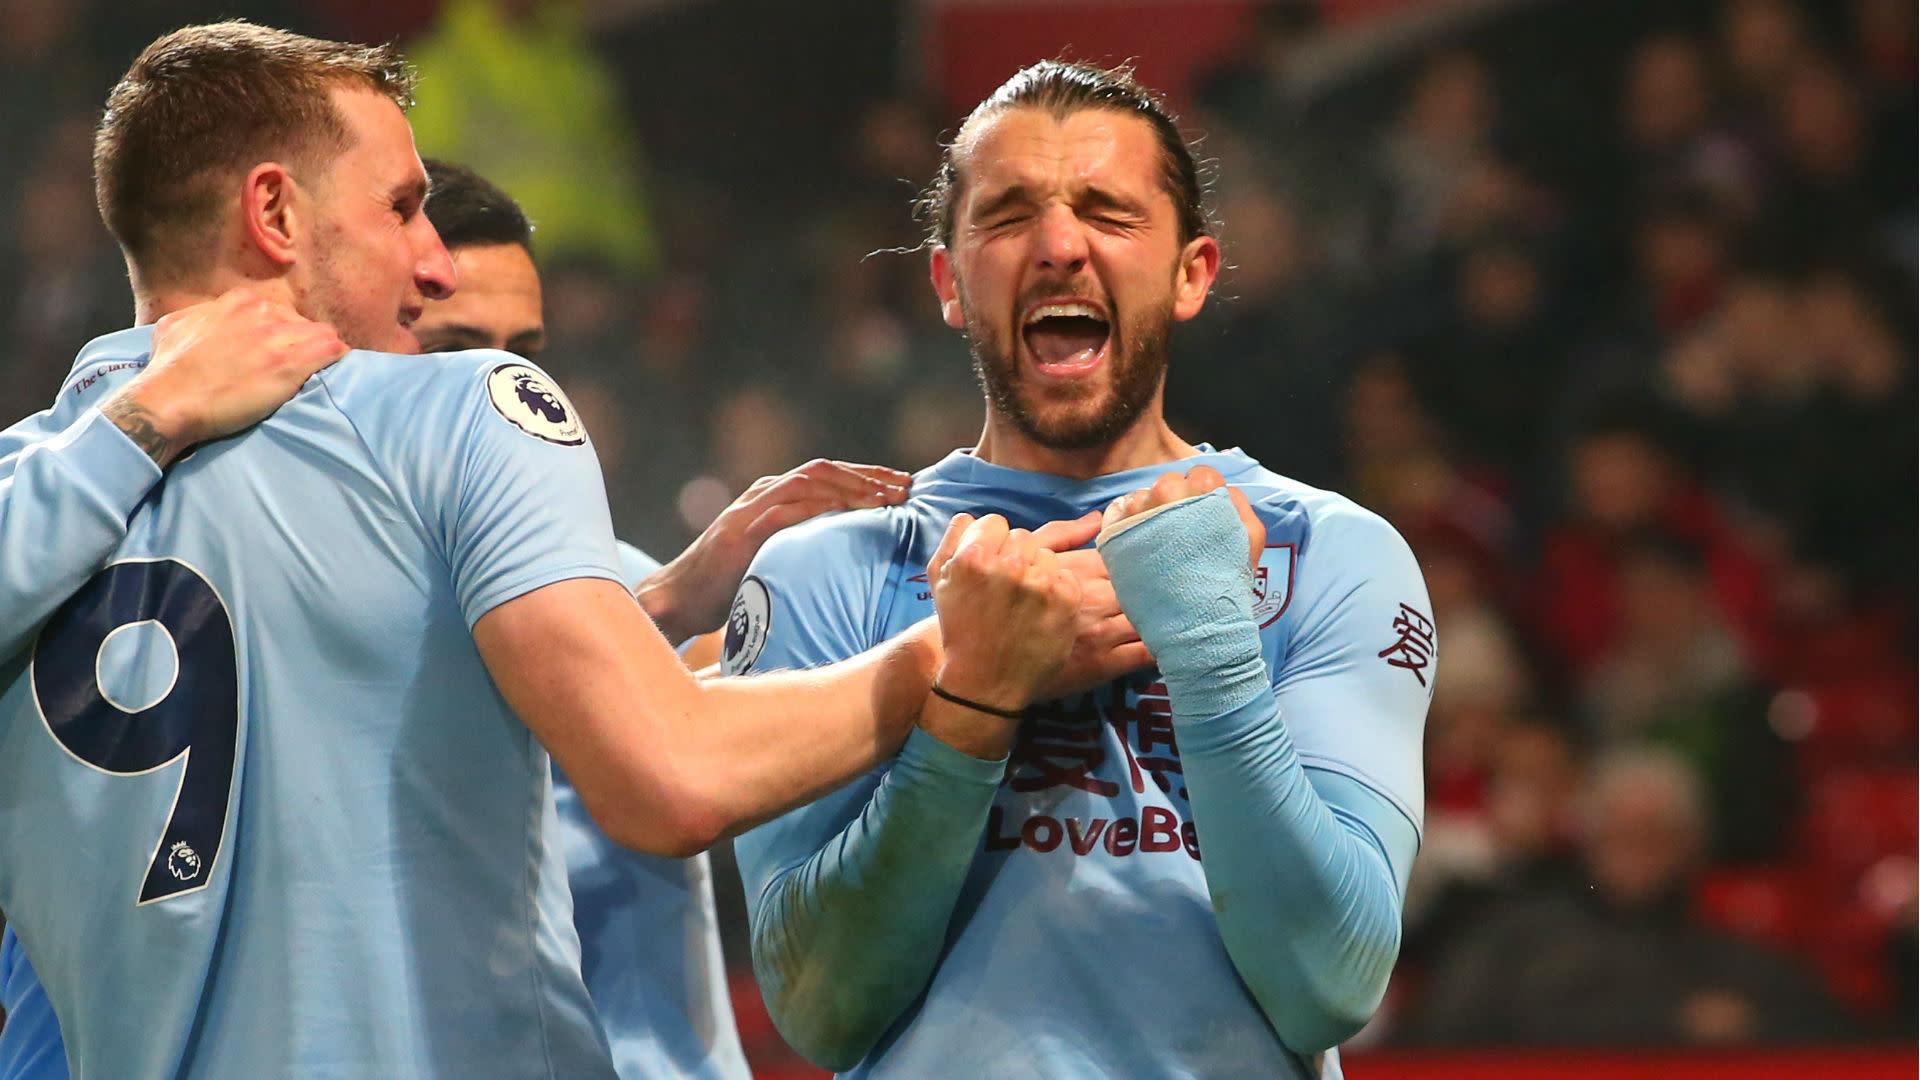 Manchester United 0-2 Burnley: Solskjaer's men dreadful in embarrassing defeat